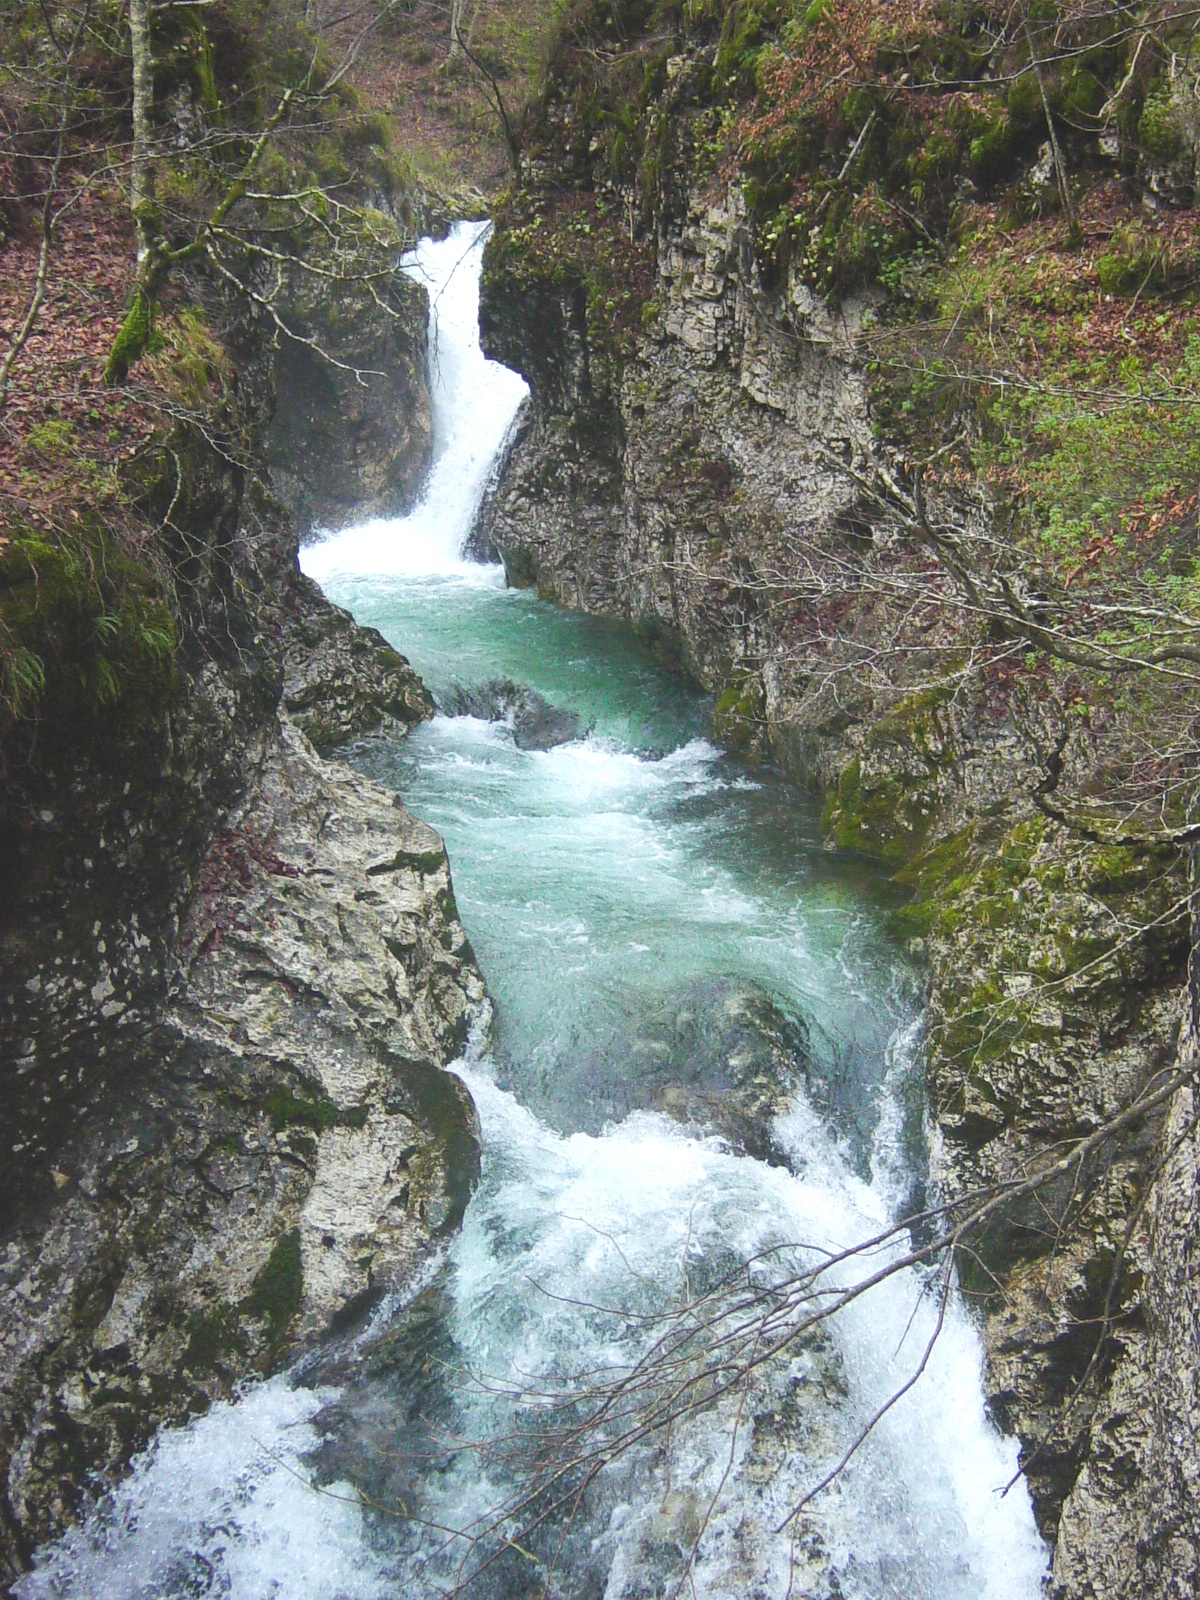 Val d'Arzino